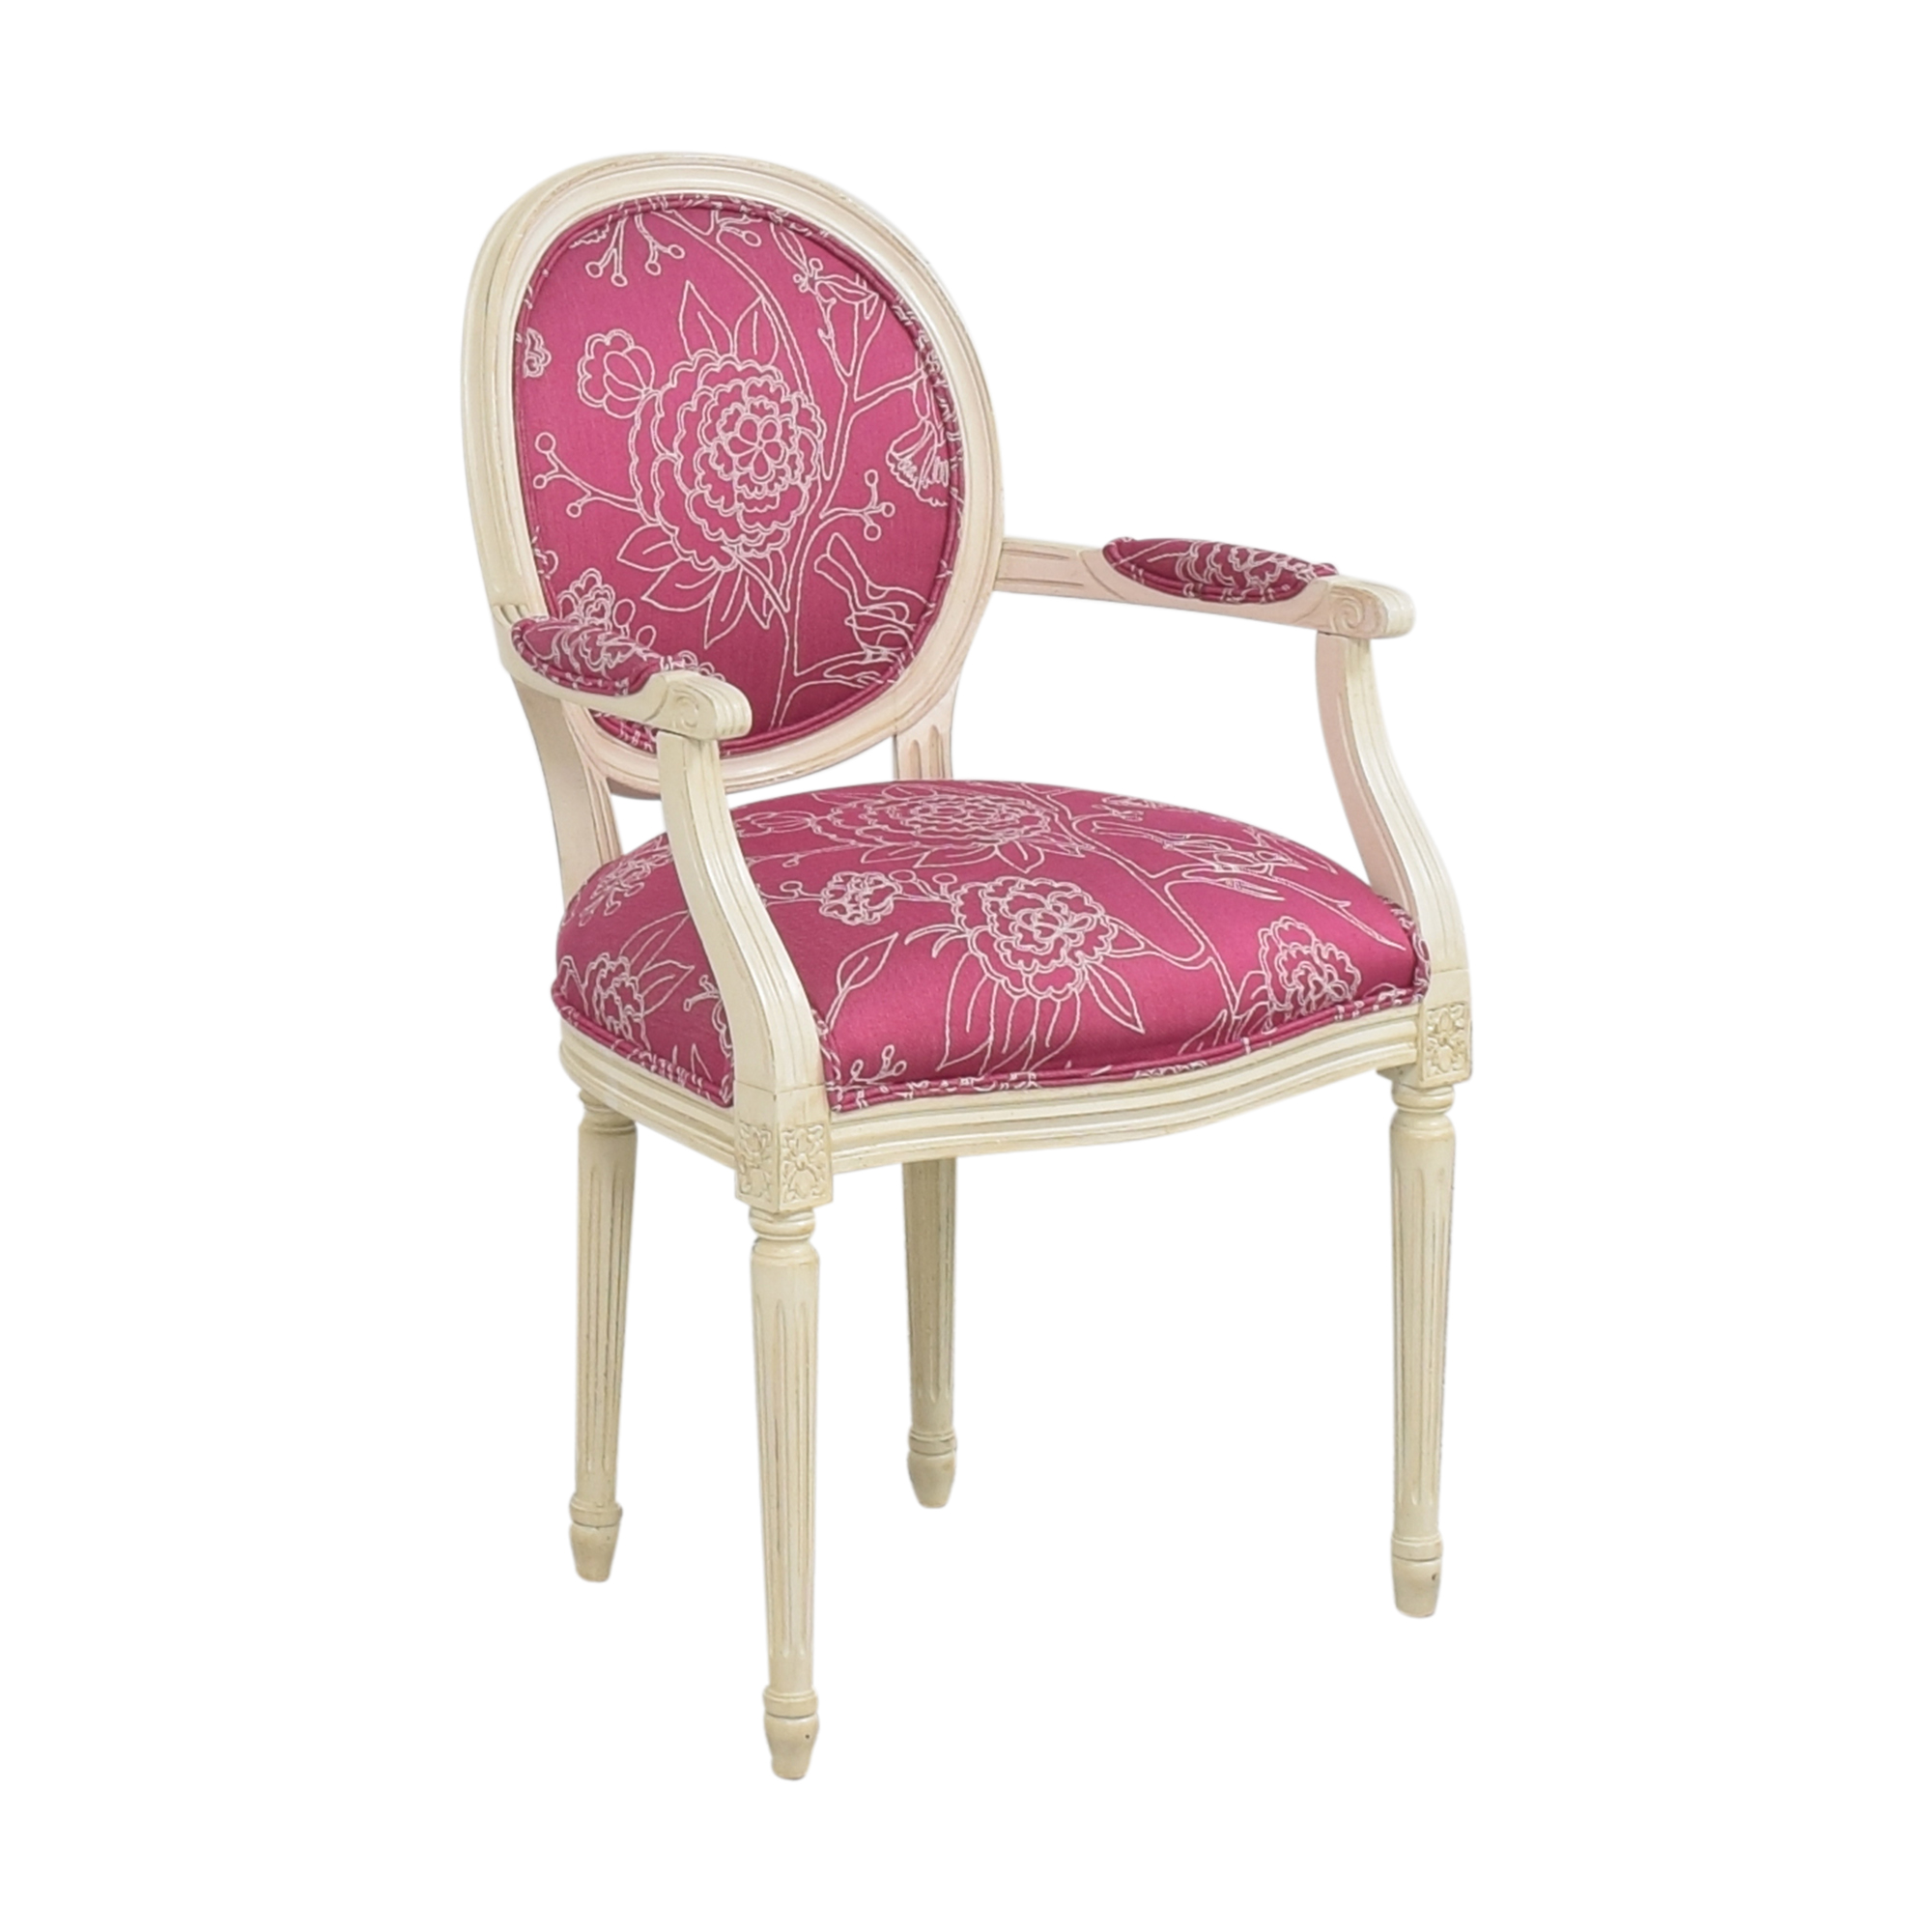 Ethan Allen Ethan Allen Josephine Armchair Accent Chairs